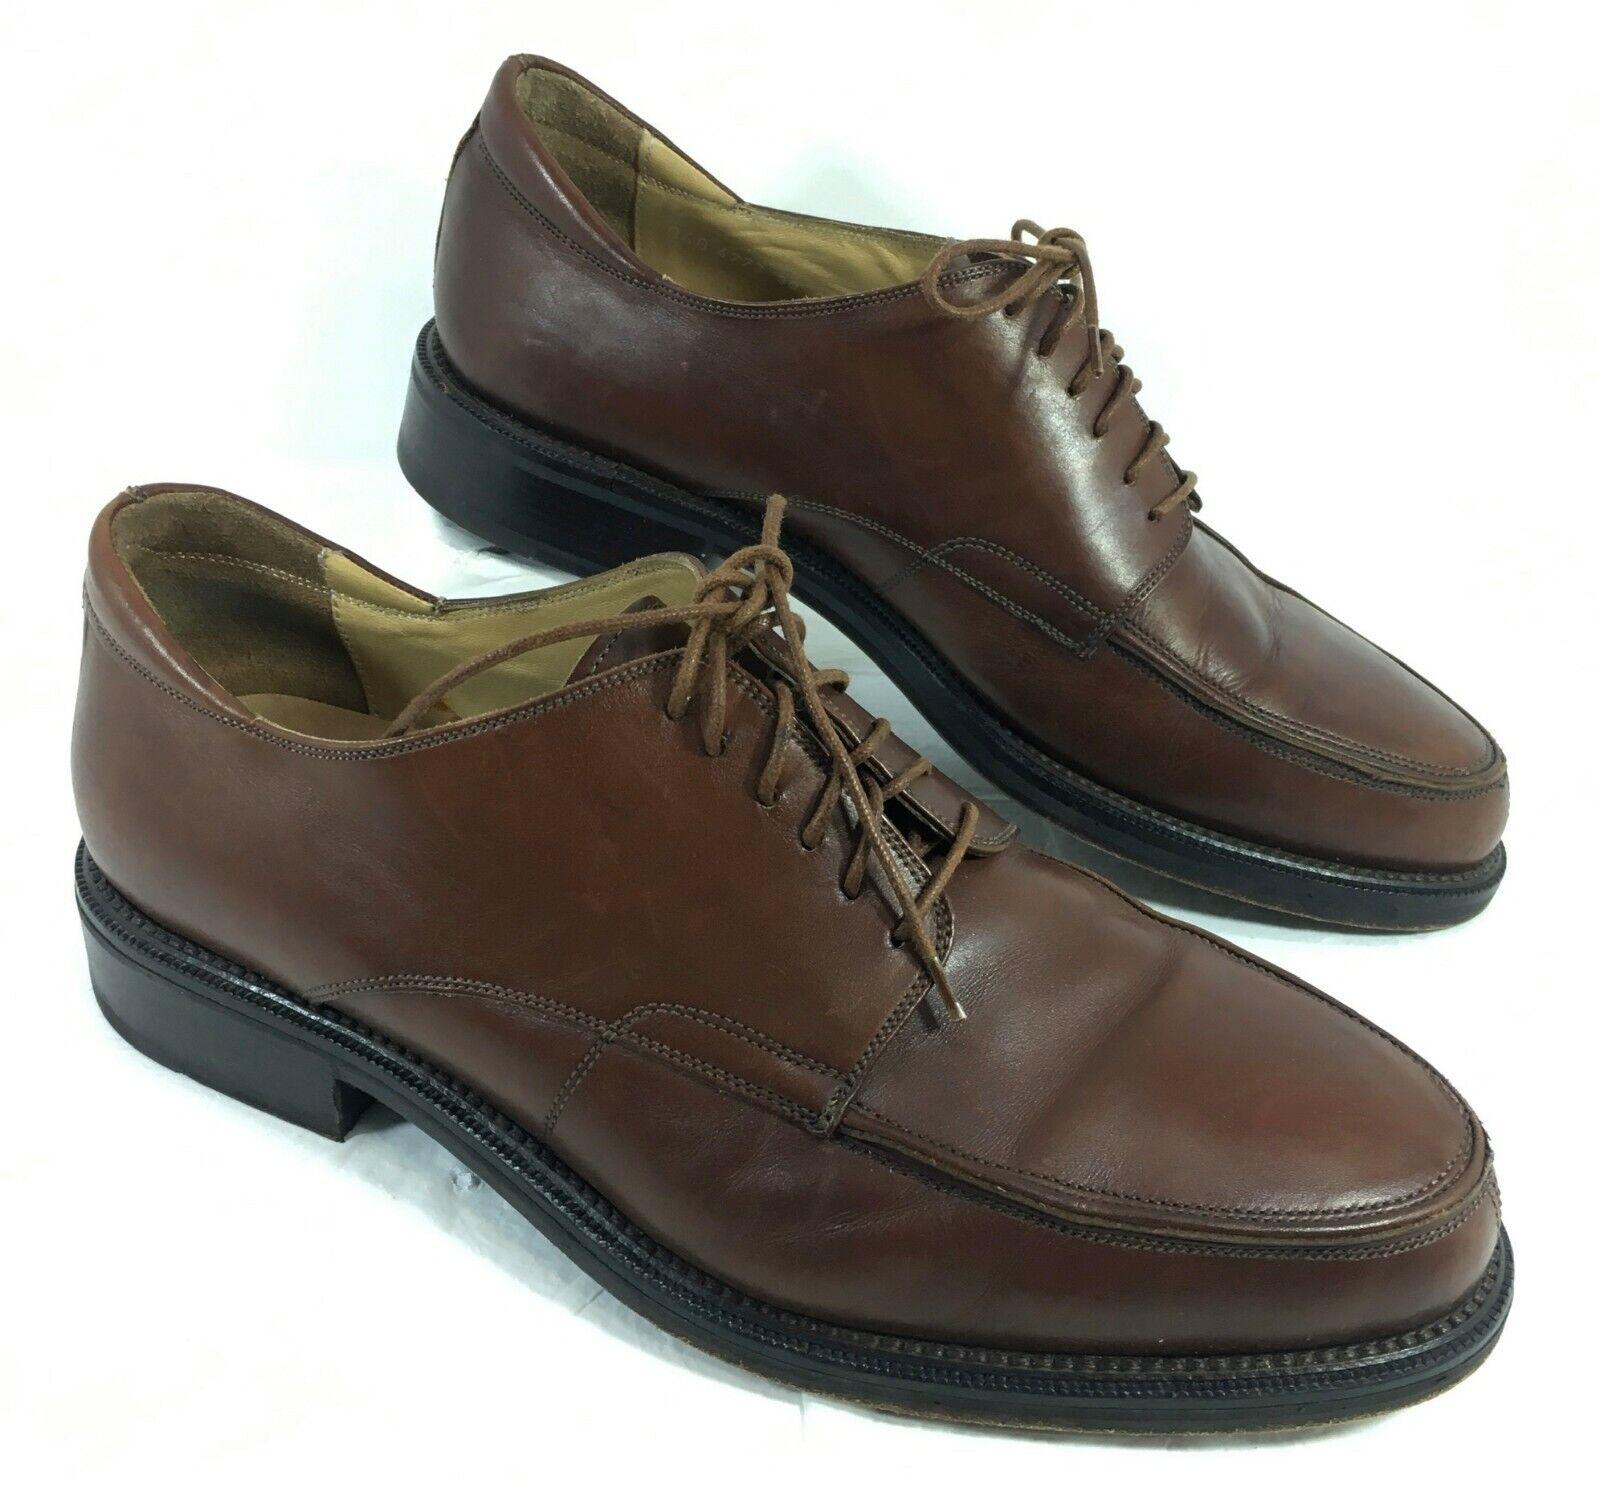 GUC Men's Cable & CO Brown leather Oxfords Sz 11 D